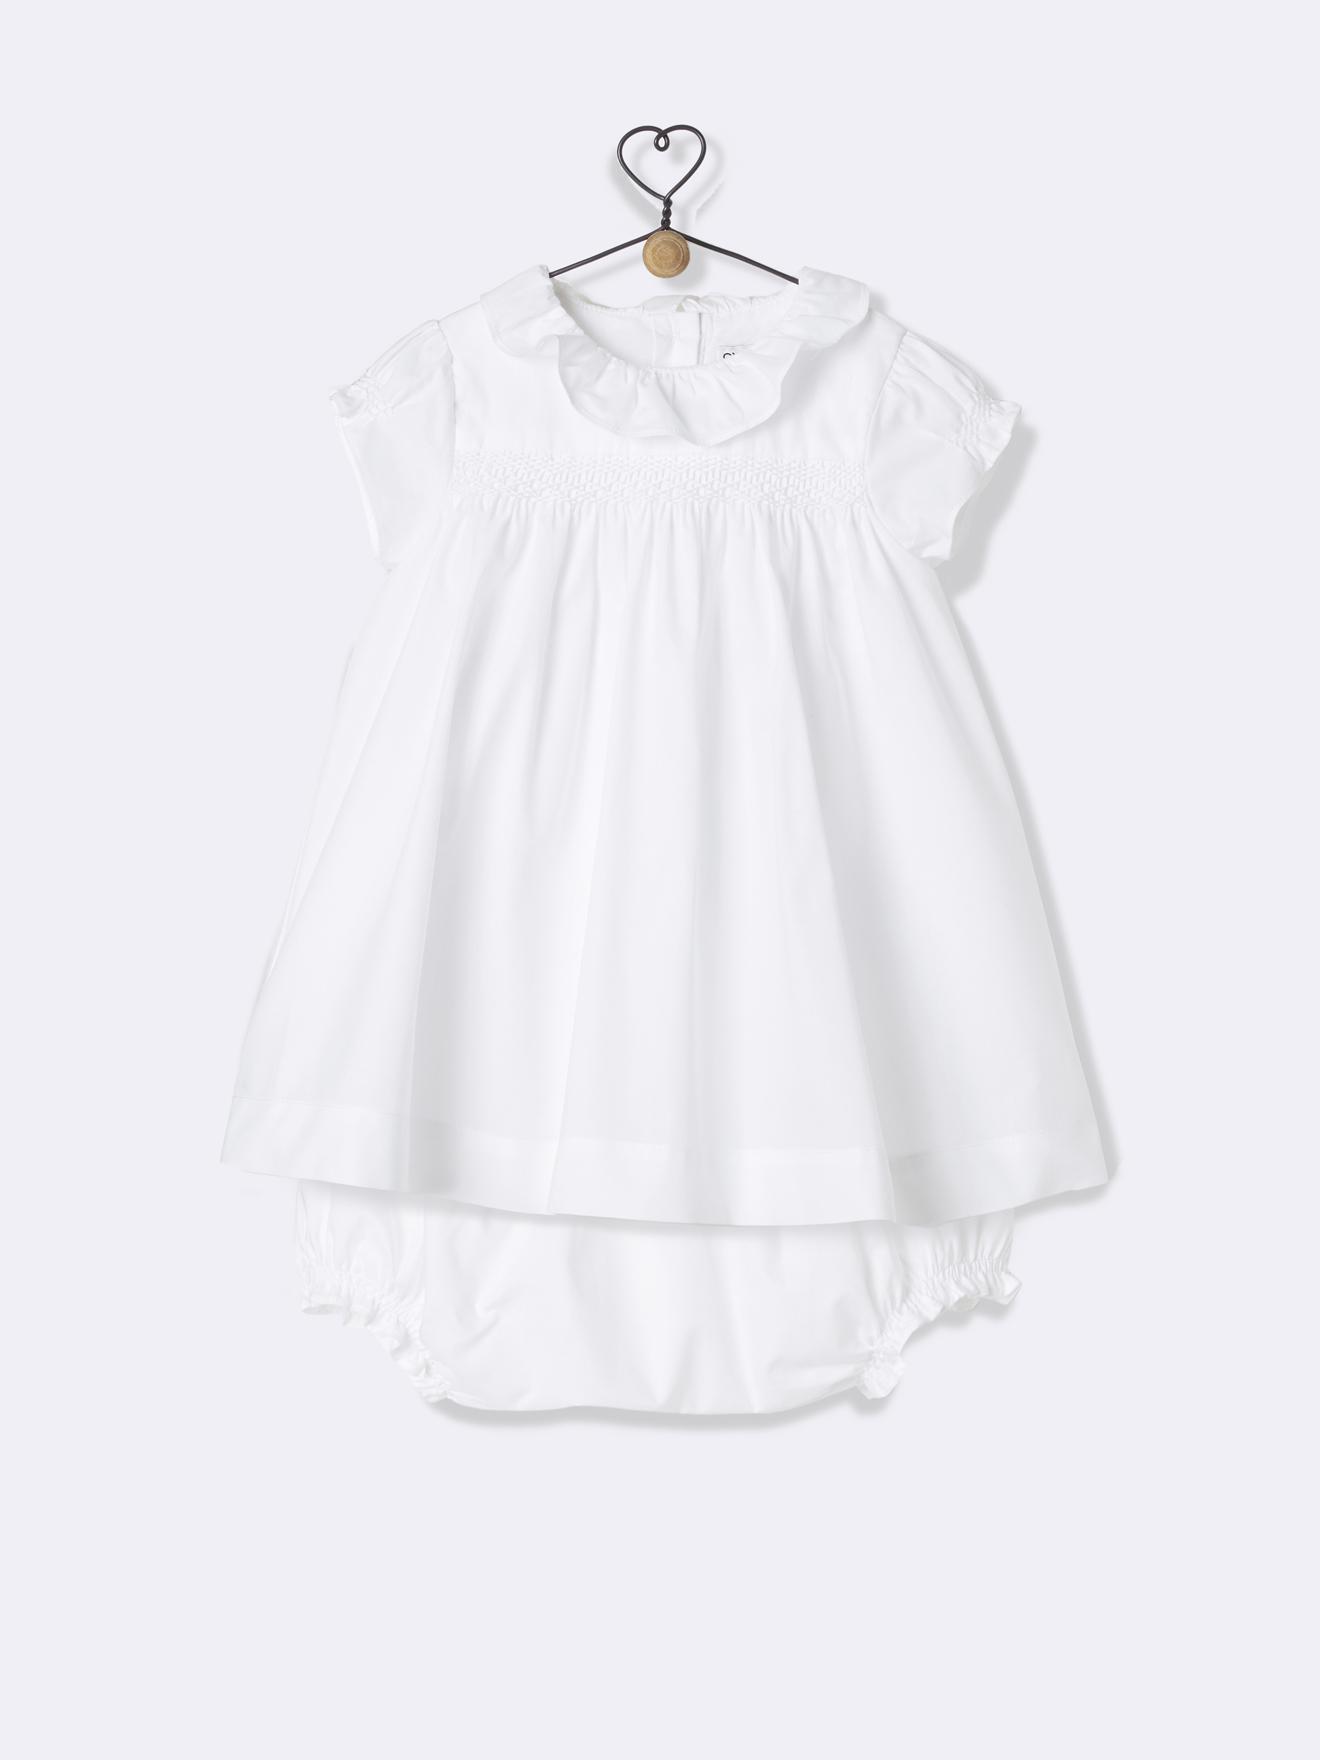 1320x1760 Baby Dress, Baby Skirt, Liberty Dress, Baptismal Dress